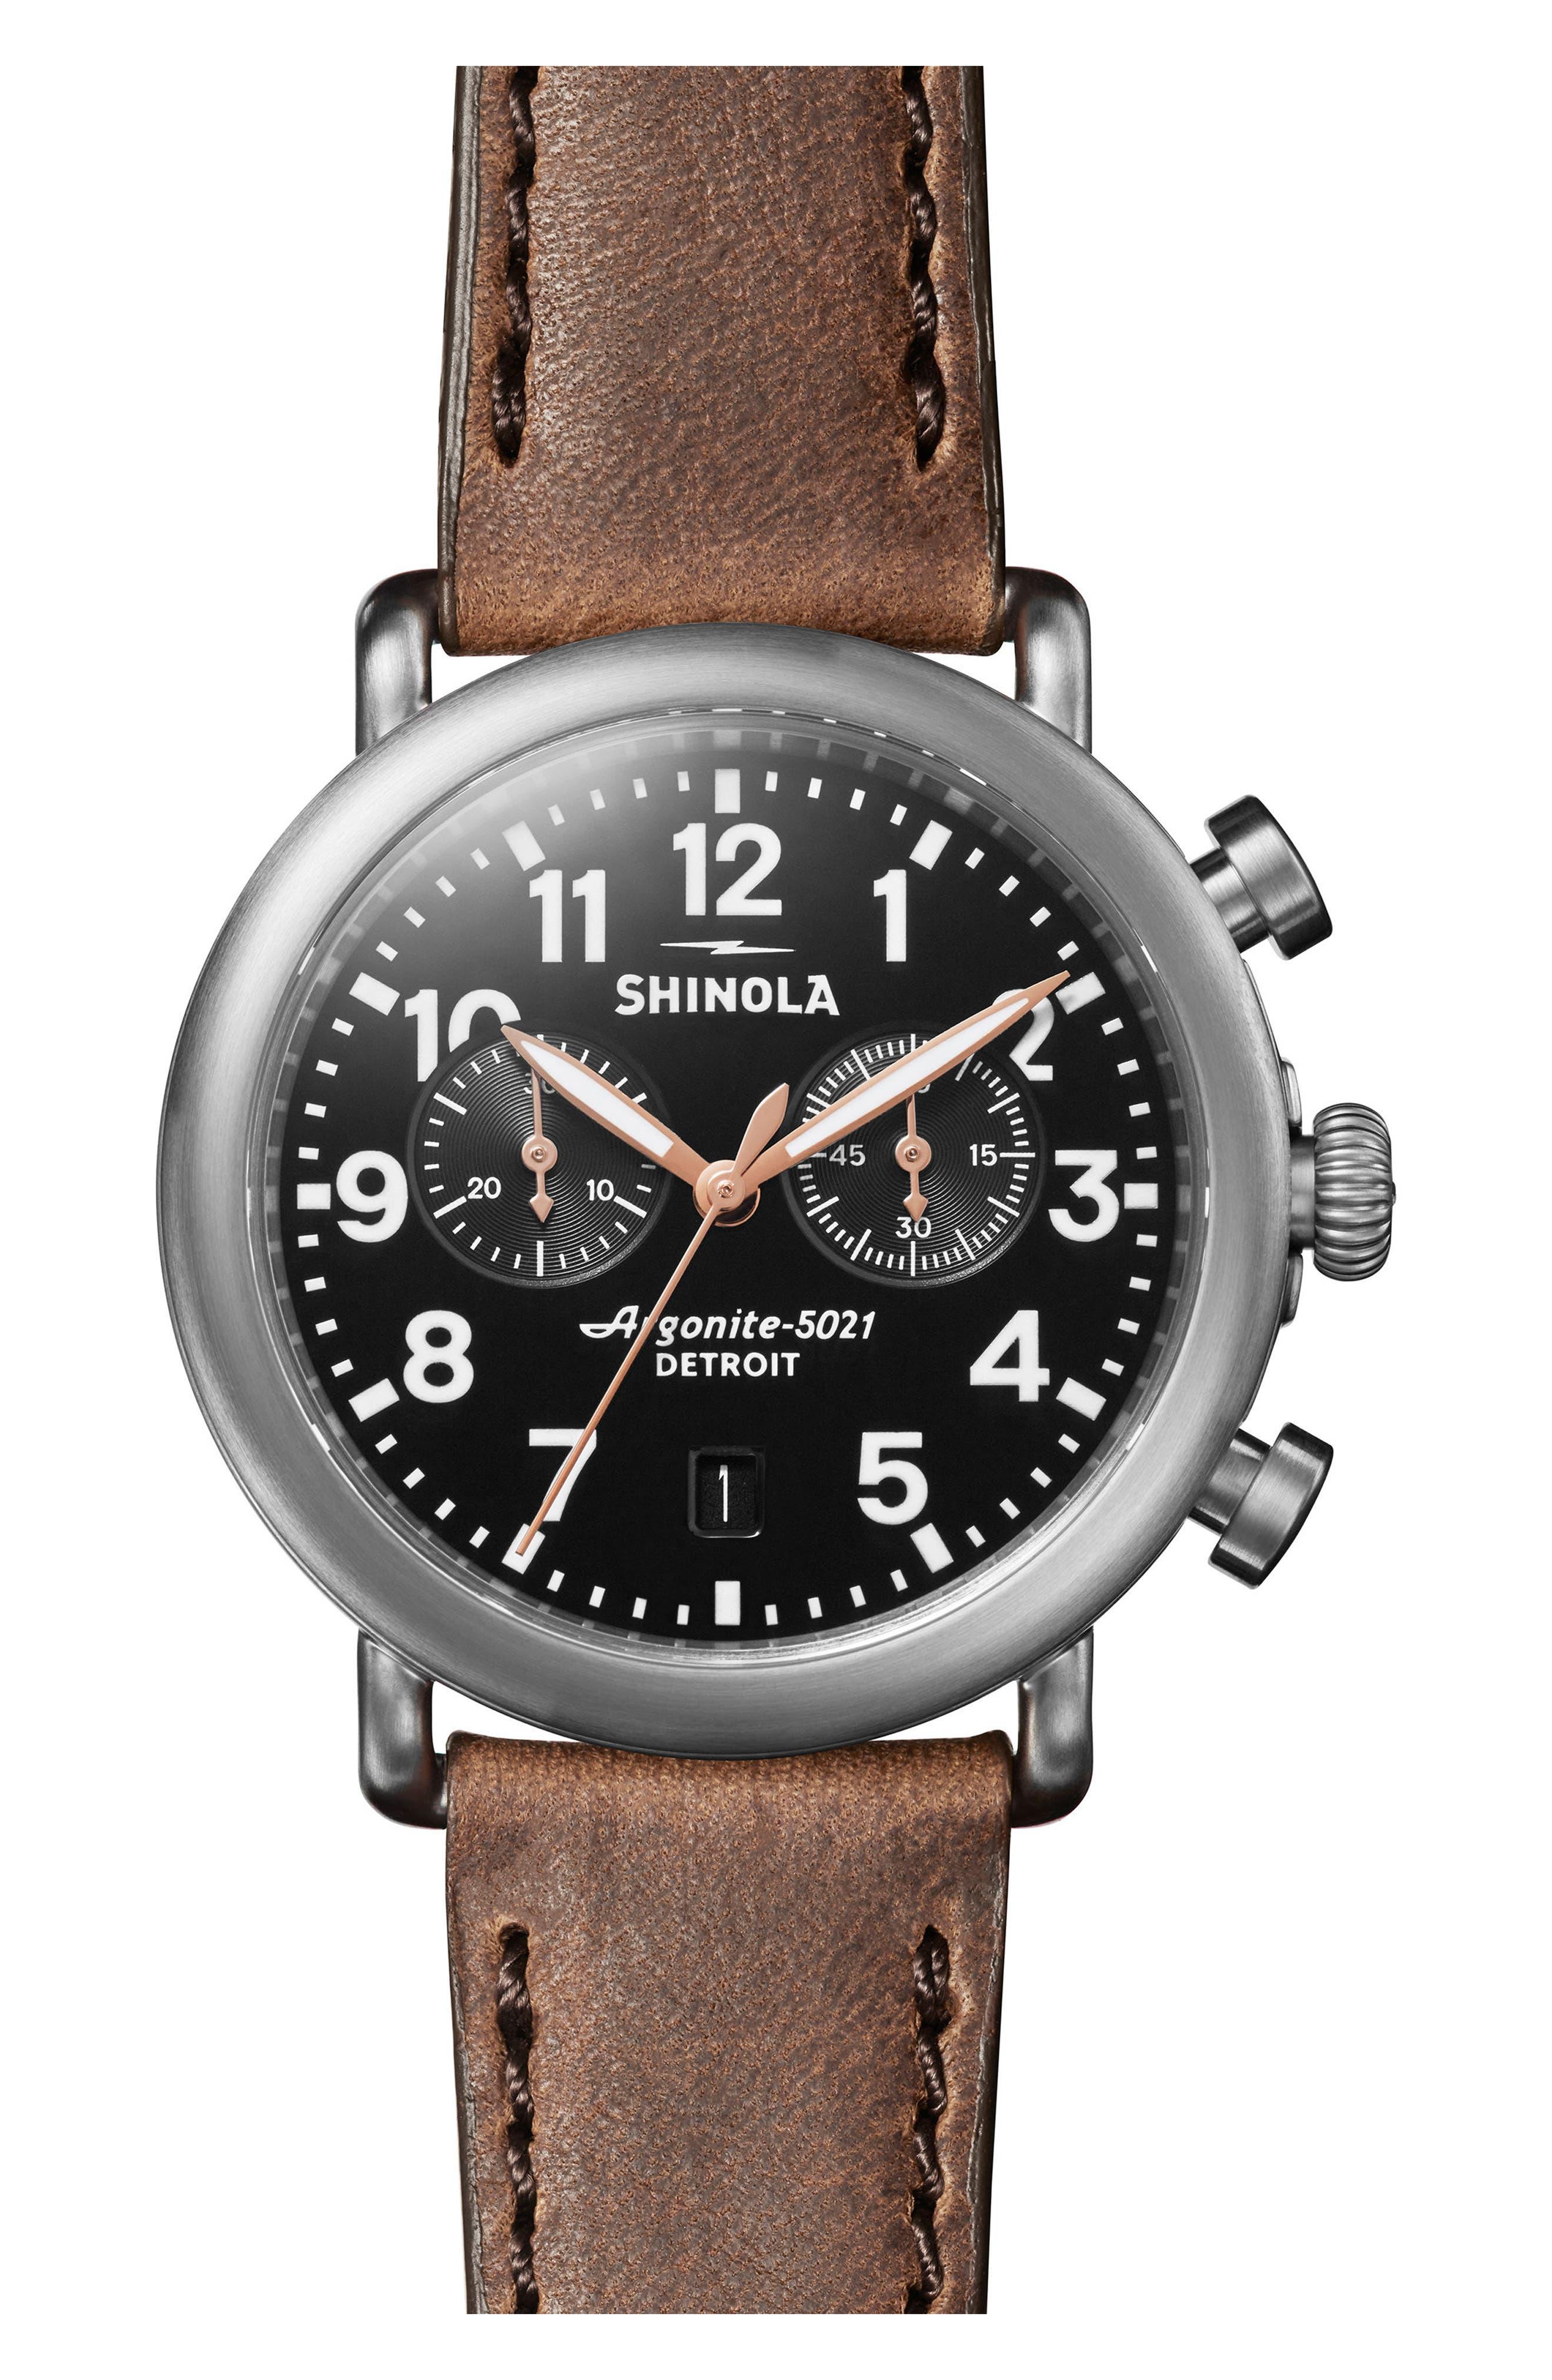 Shinola Men's Runwell Chronograph Leather Strap Watch In Blckglossy